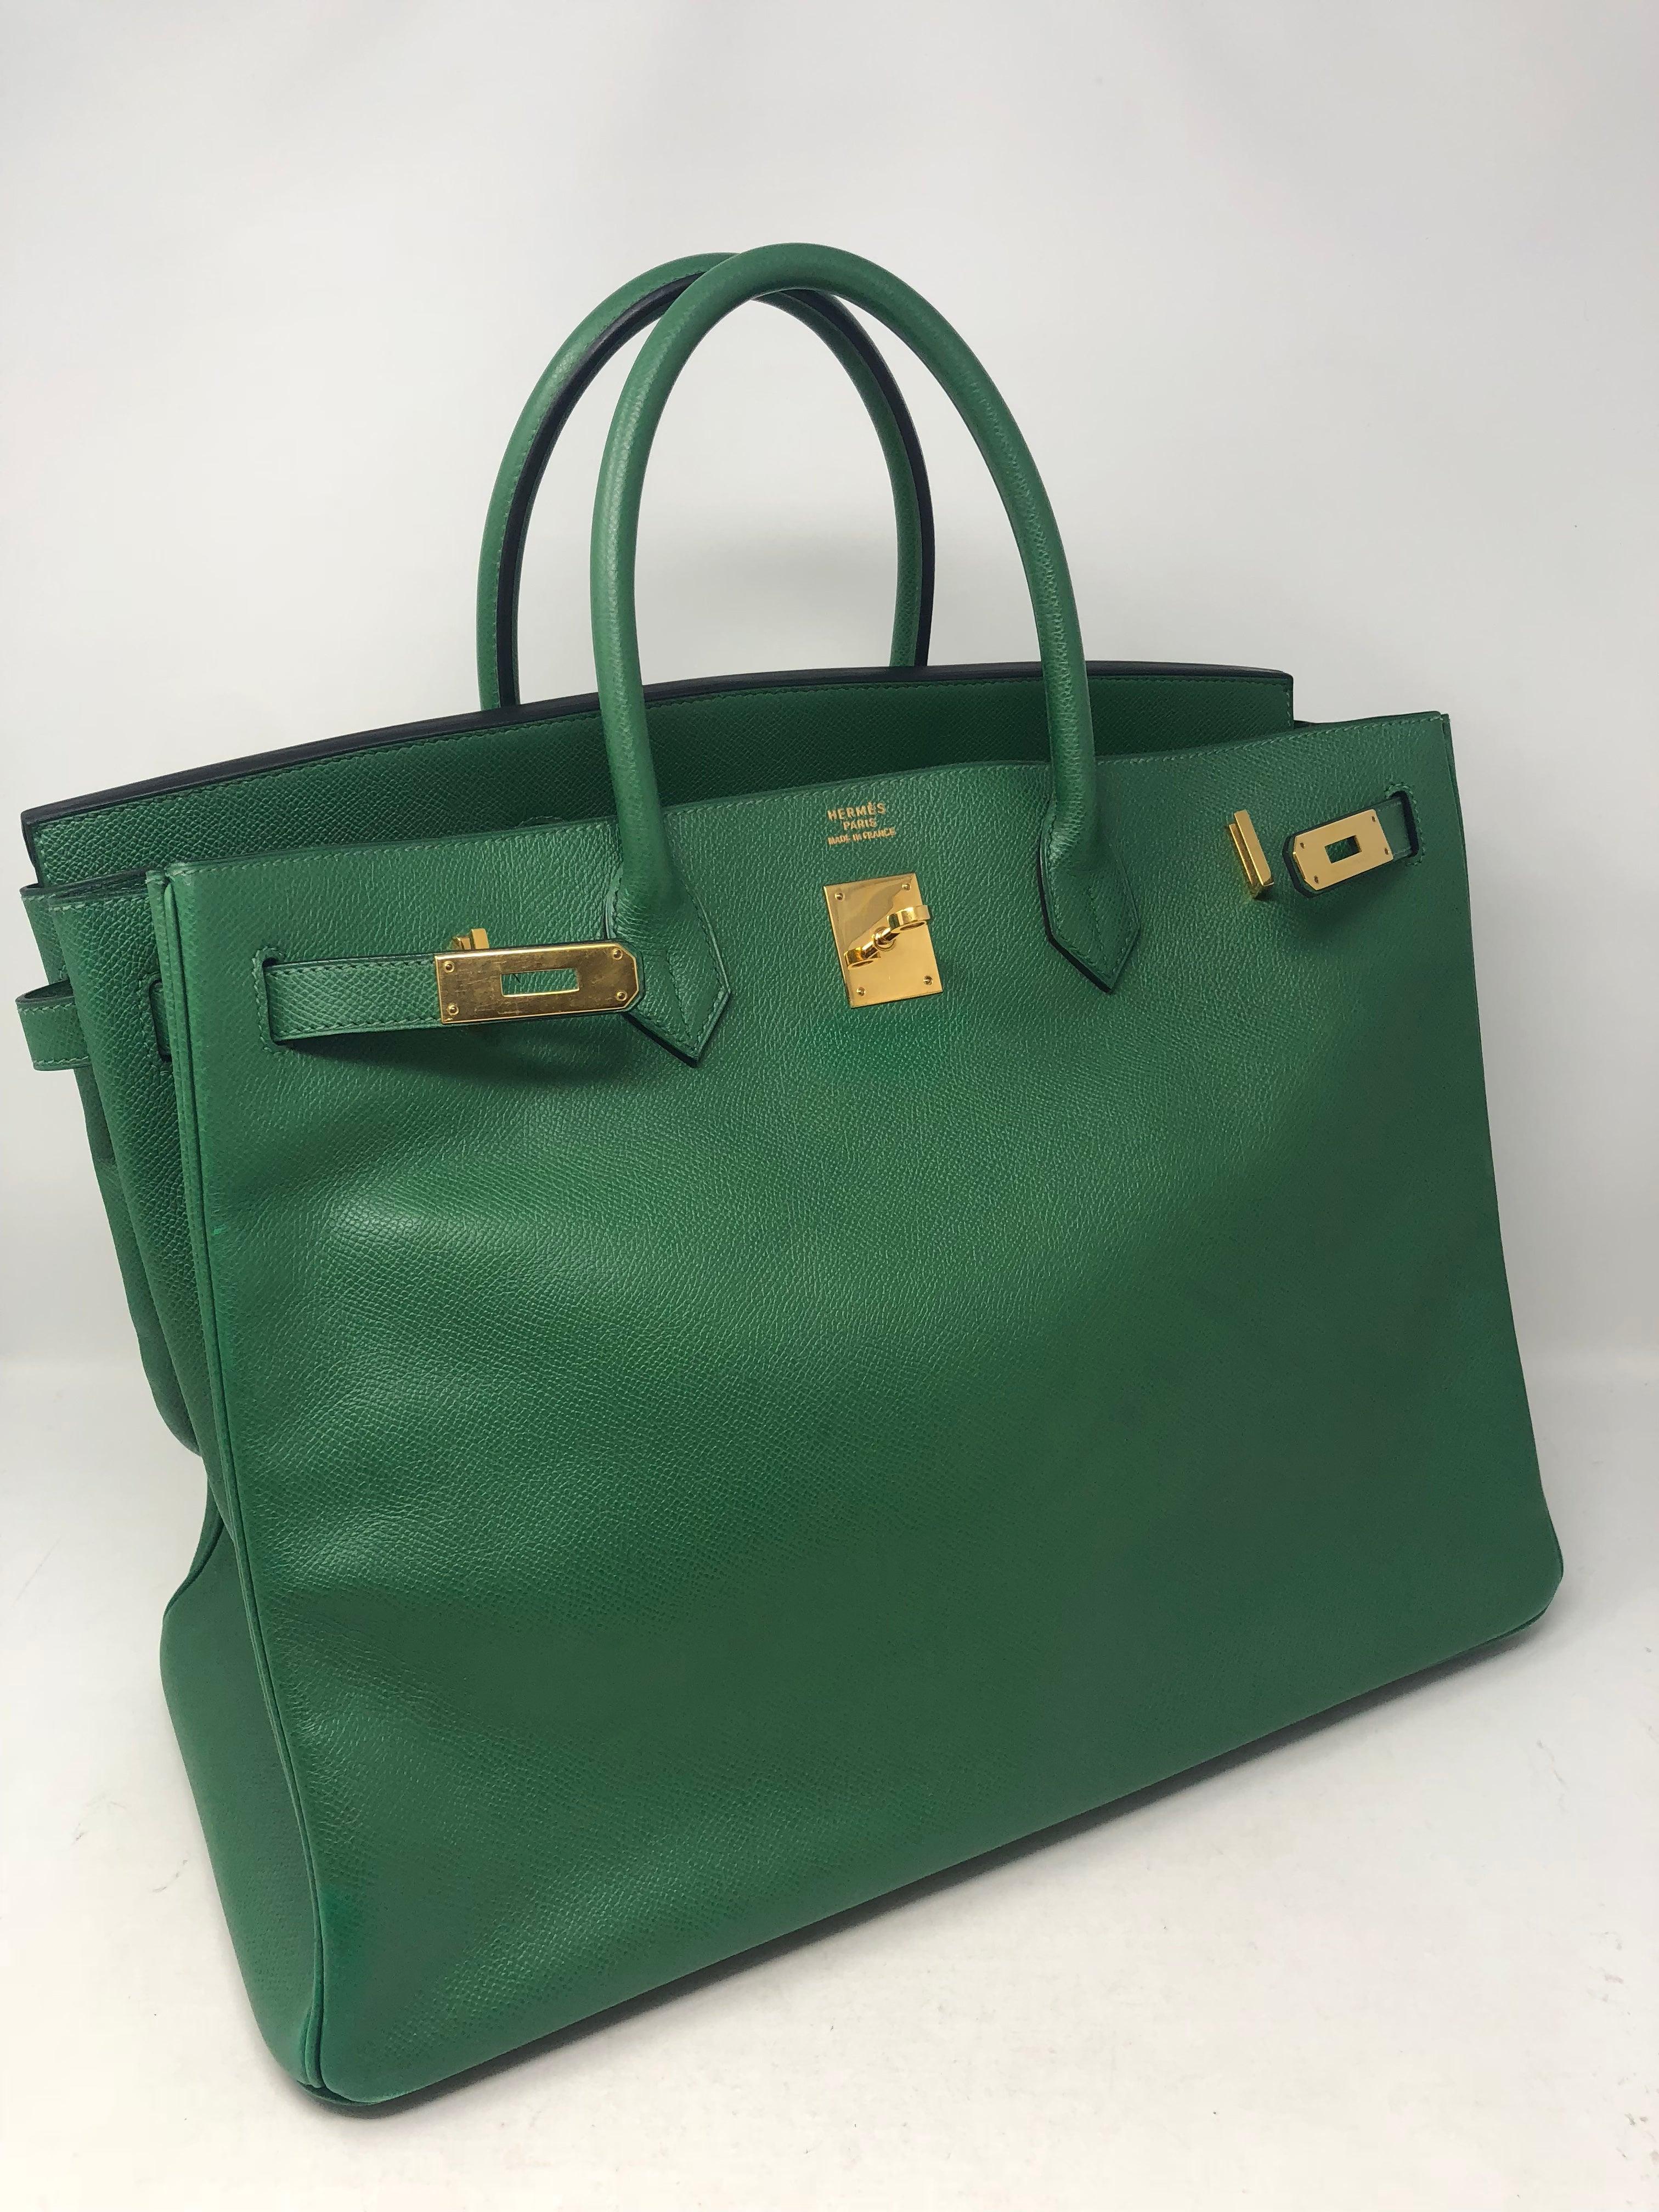 0e9b6a5e29 Hermes Birkin 40 Green For Sale at 1stdibs